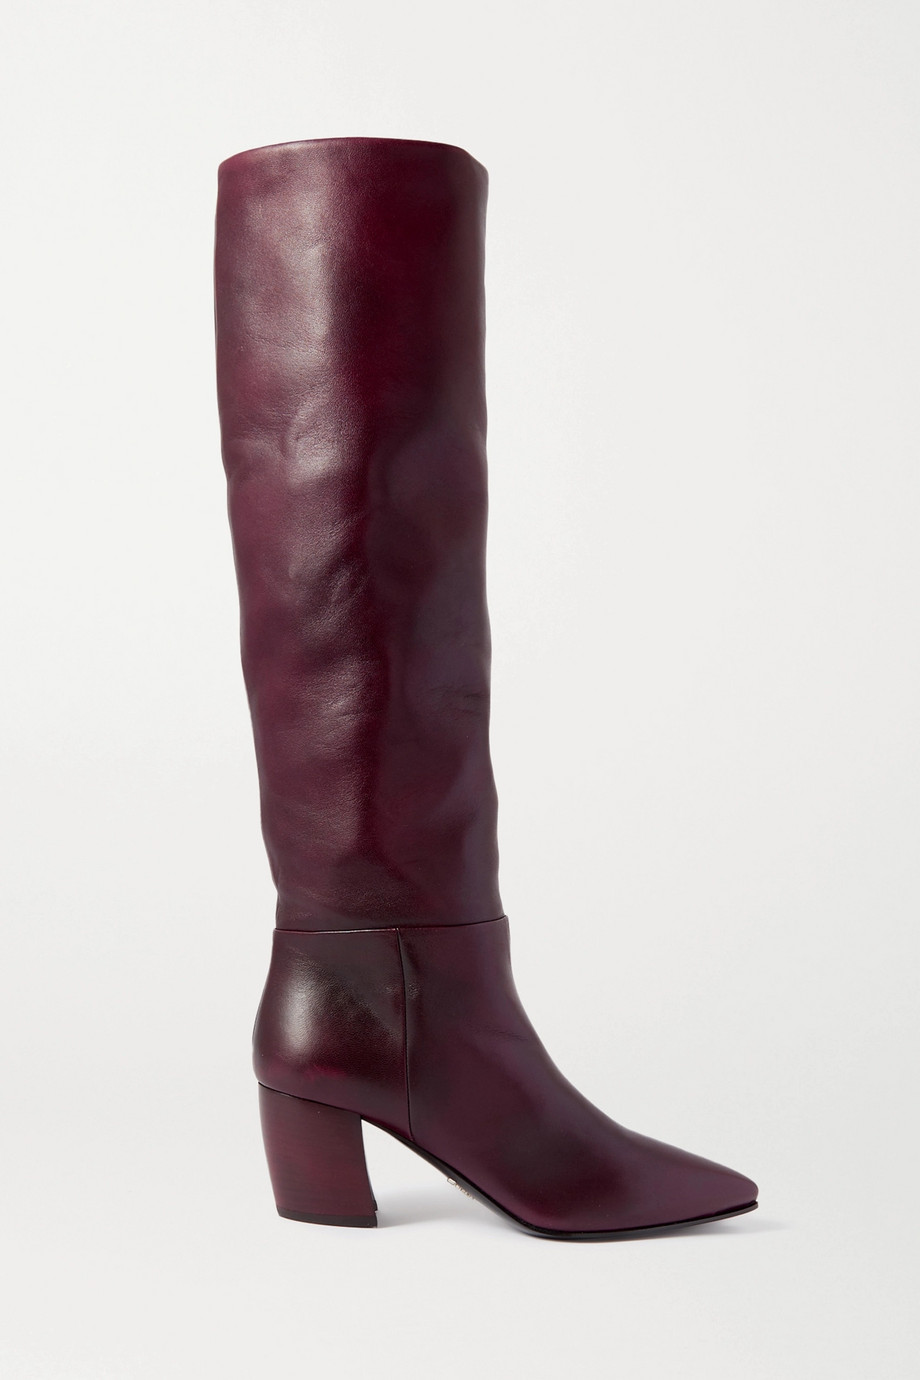 Prada 65 leather knee boots